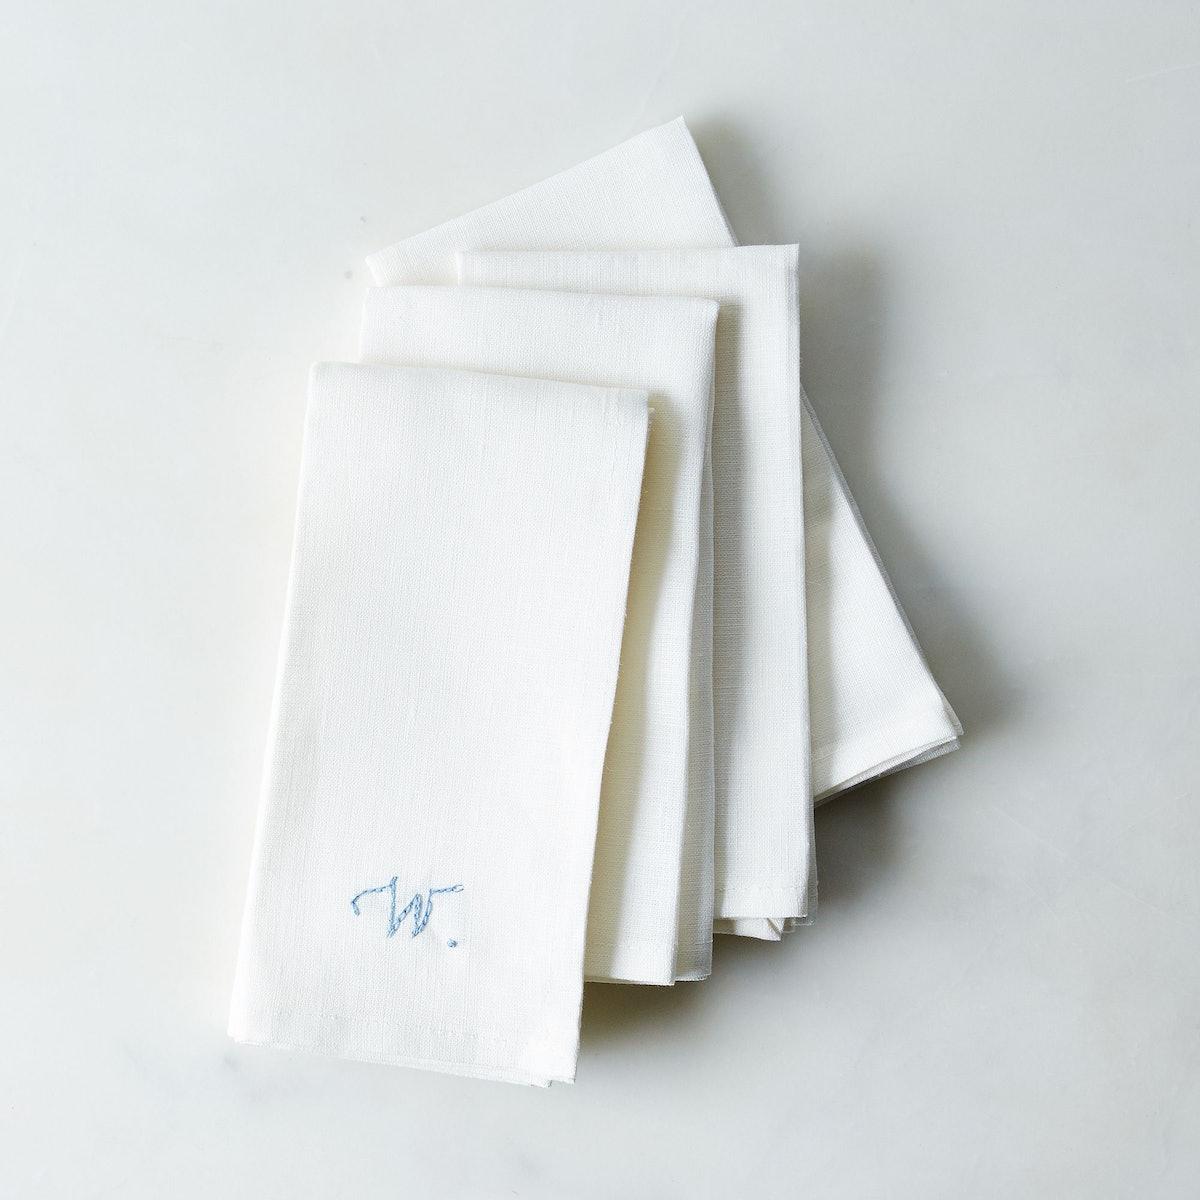 Celina Mancurti White Linen Napkins with Monogram Option (Set of 4)